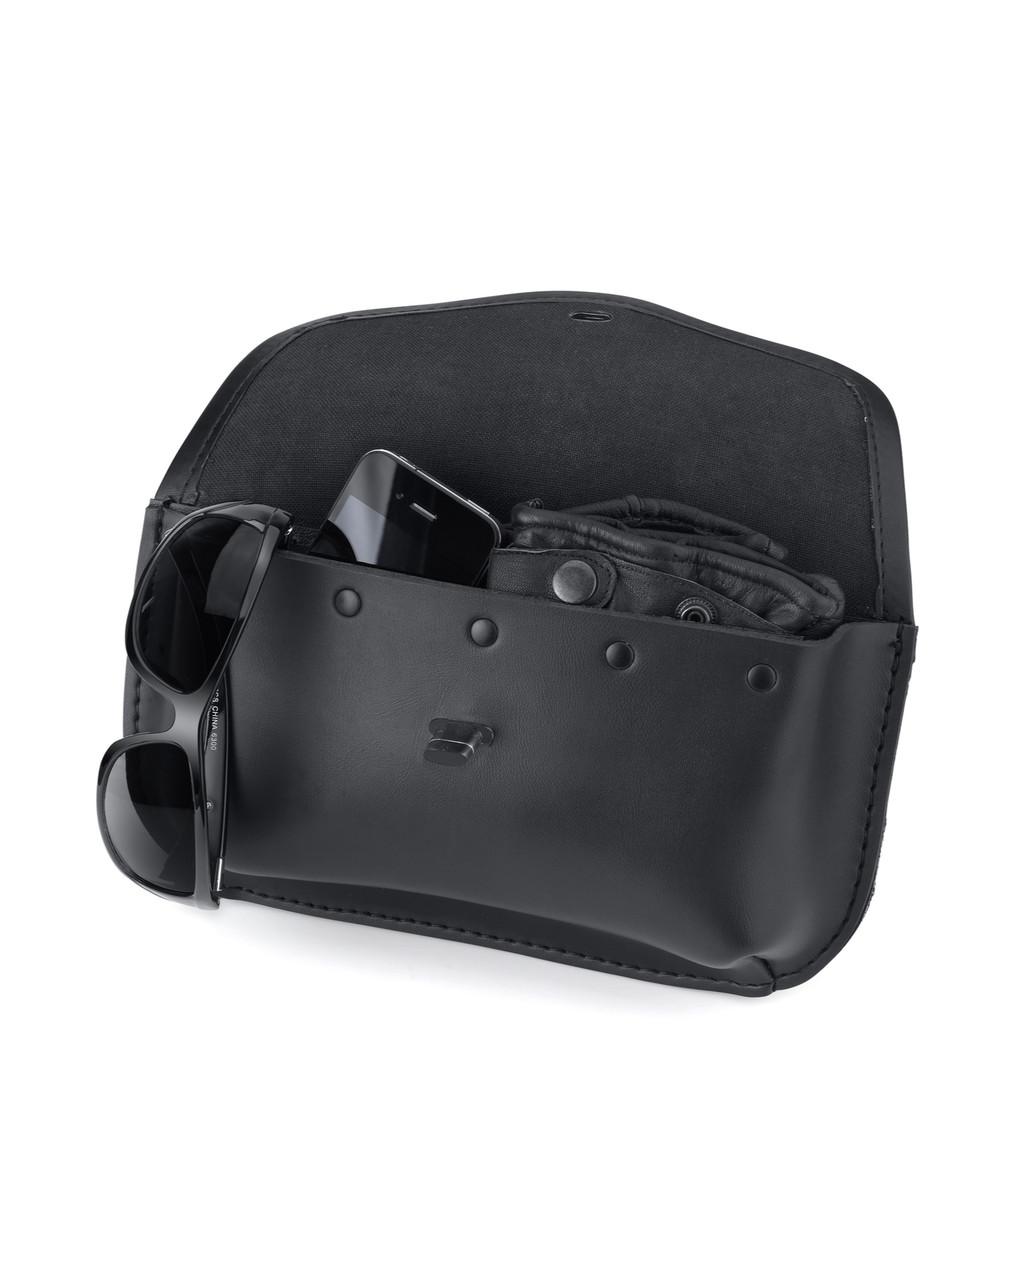 Revival Series Motorcycle Windshield Bag For Harley Davidson Storage View